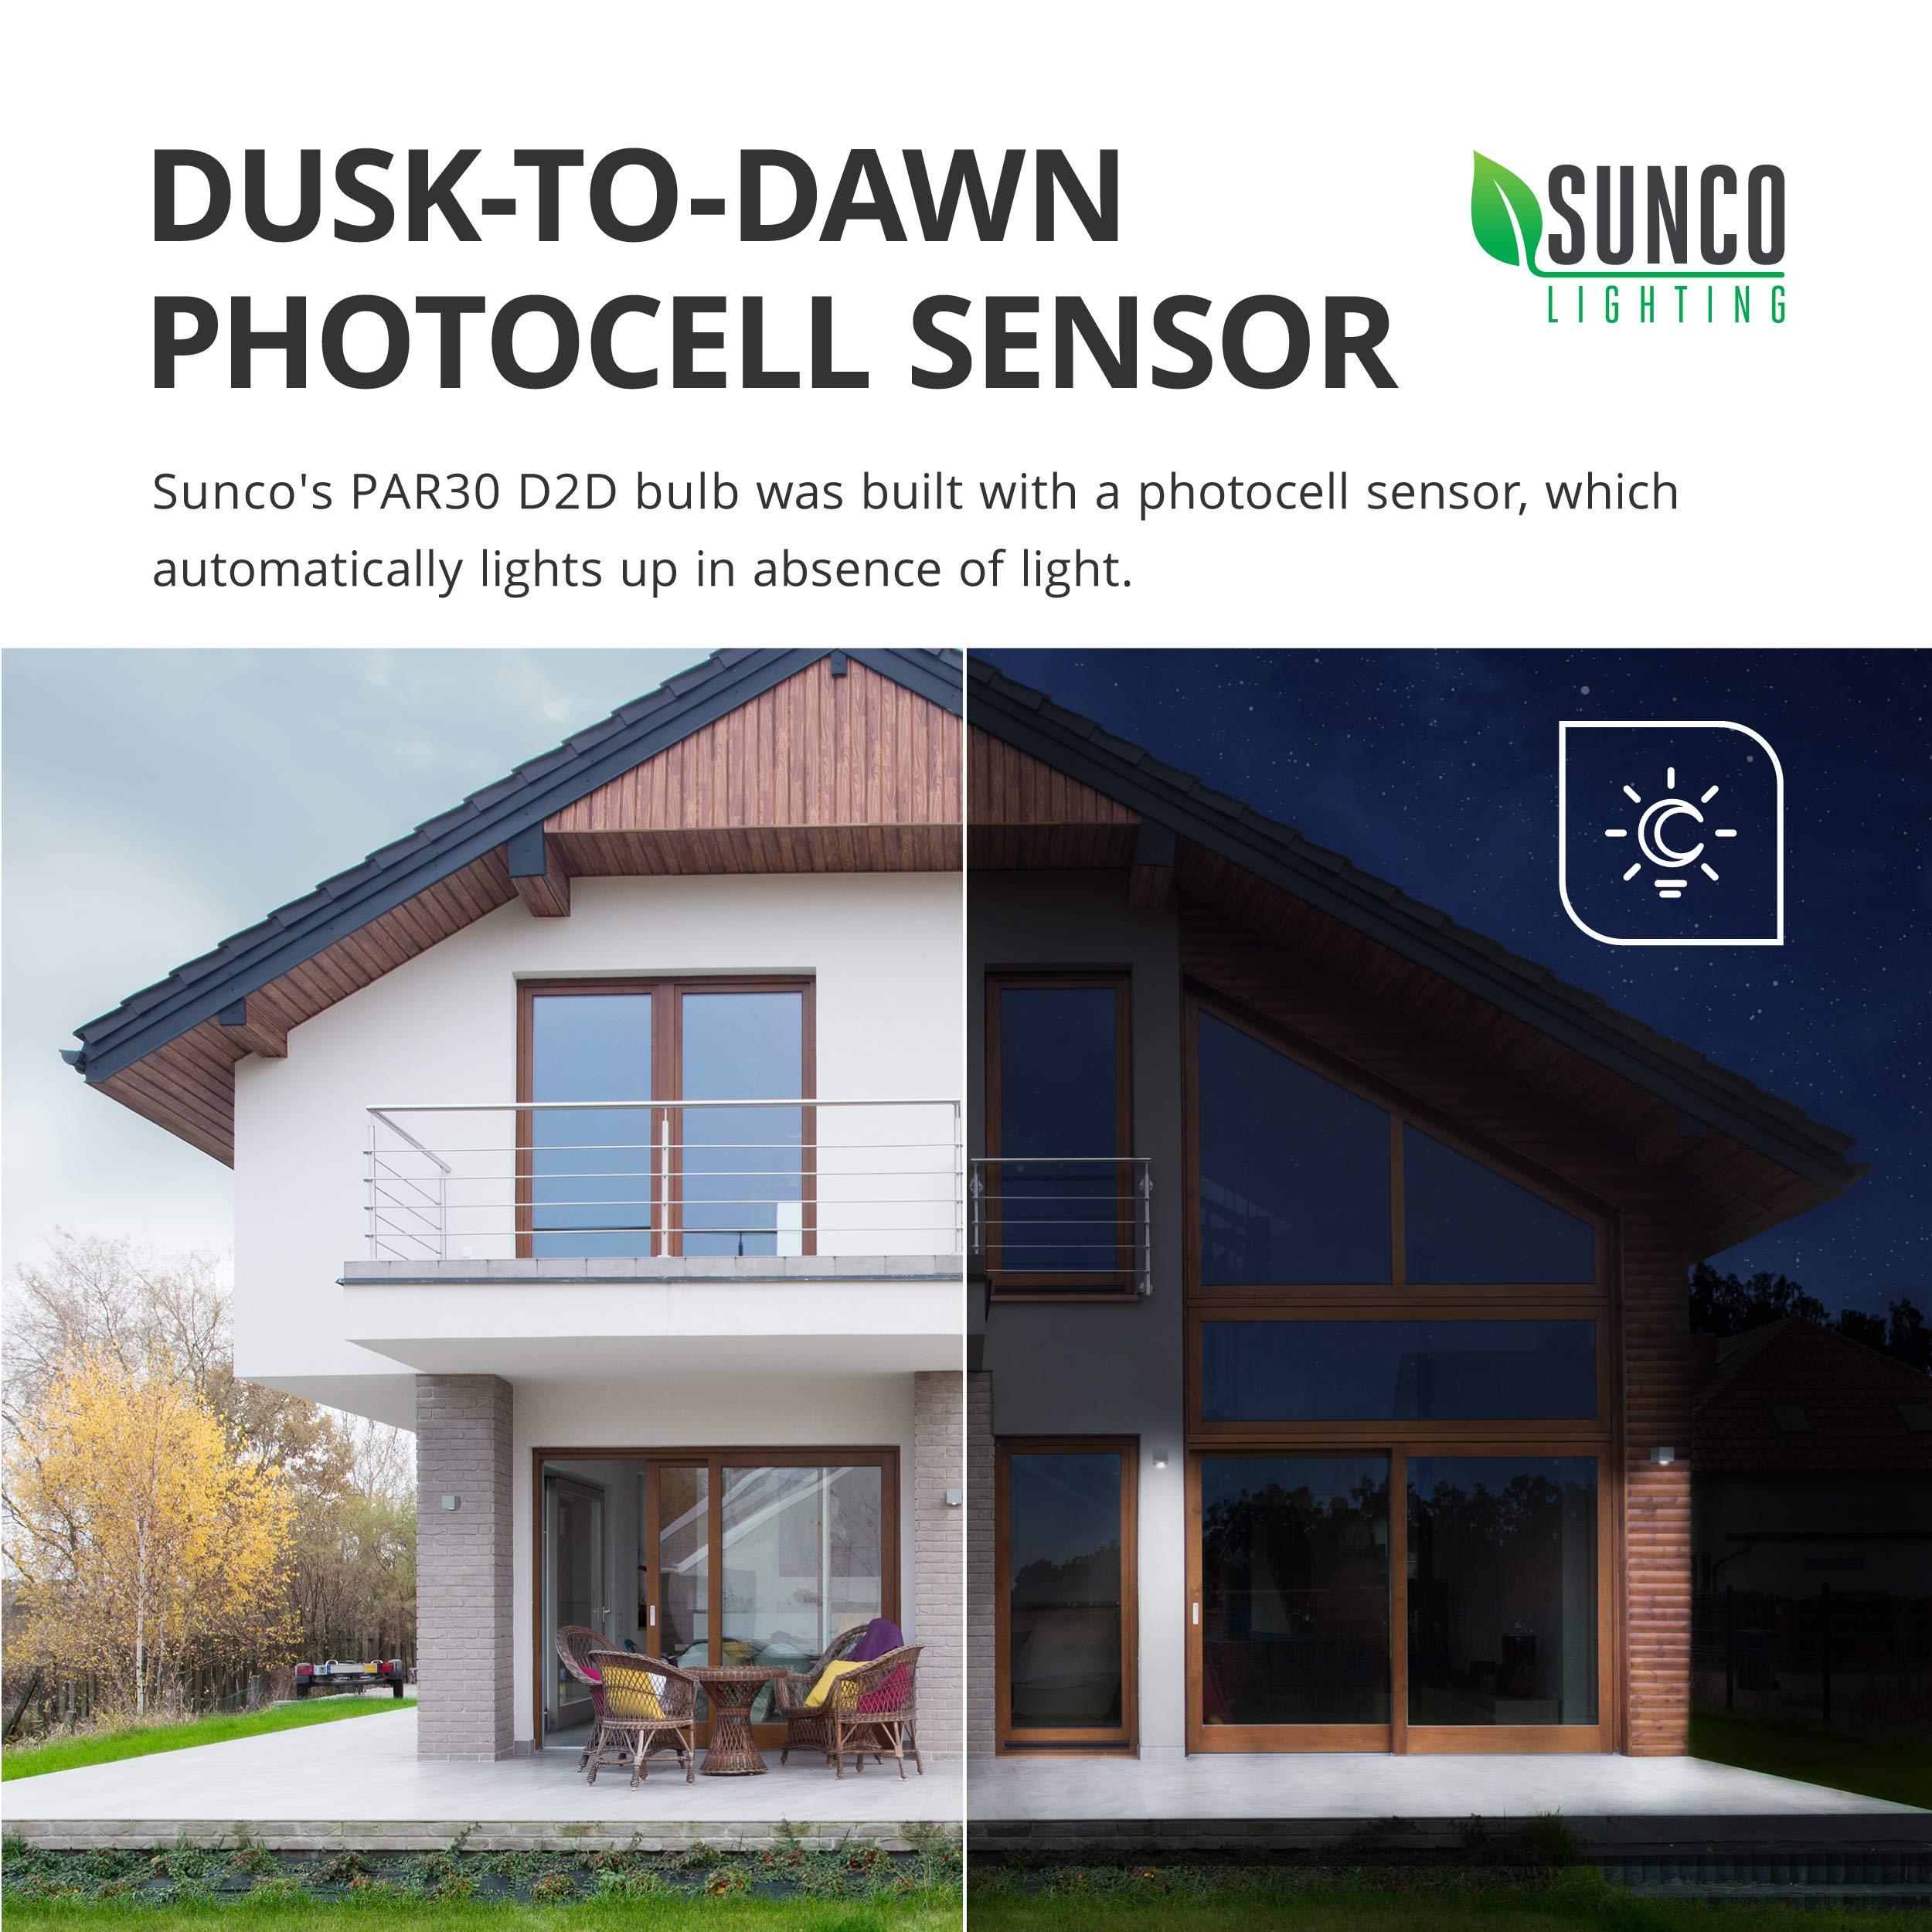 Sunco Lighting 4 Pack PAR30 LED Bulb, Dusk-to-Dawn Photocell Sensor, 11W=75W, 5000K Daylight, 850 LM, Auto On/Off Security Flood Light - UL by Sunco Lighting (Image #4)